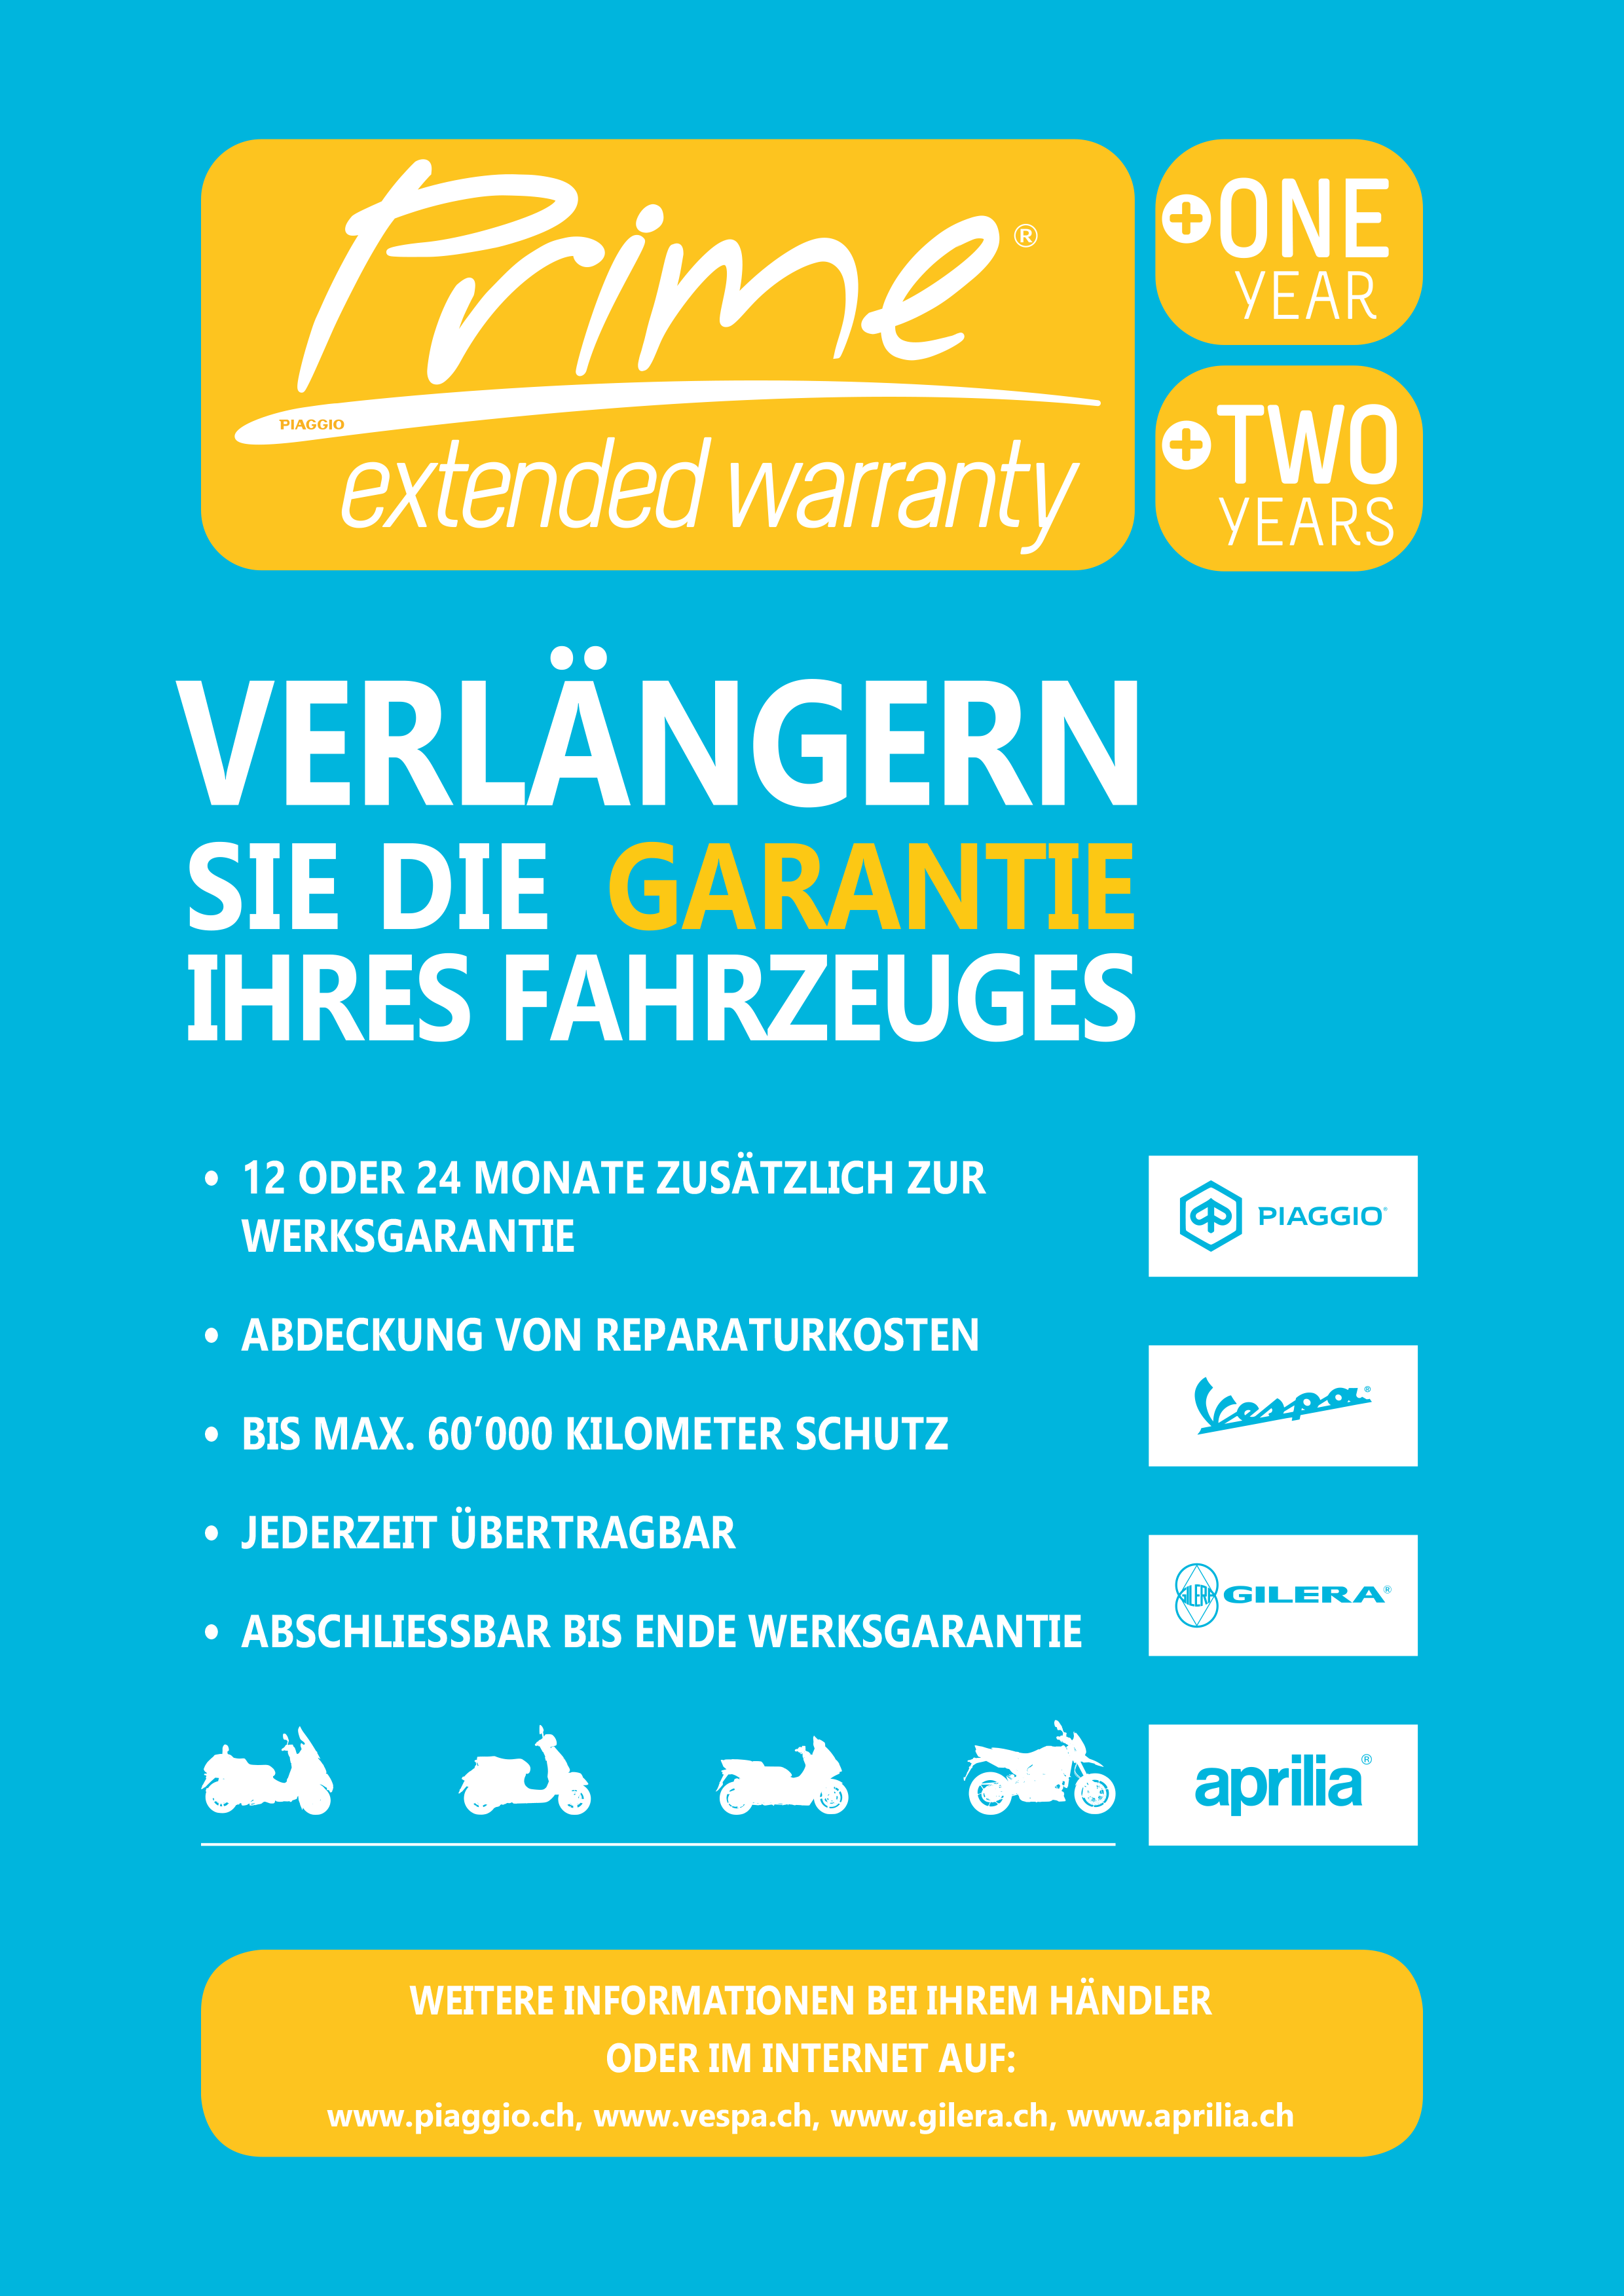 Prime_warranty_ofrag_DINA4_v5_DE